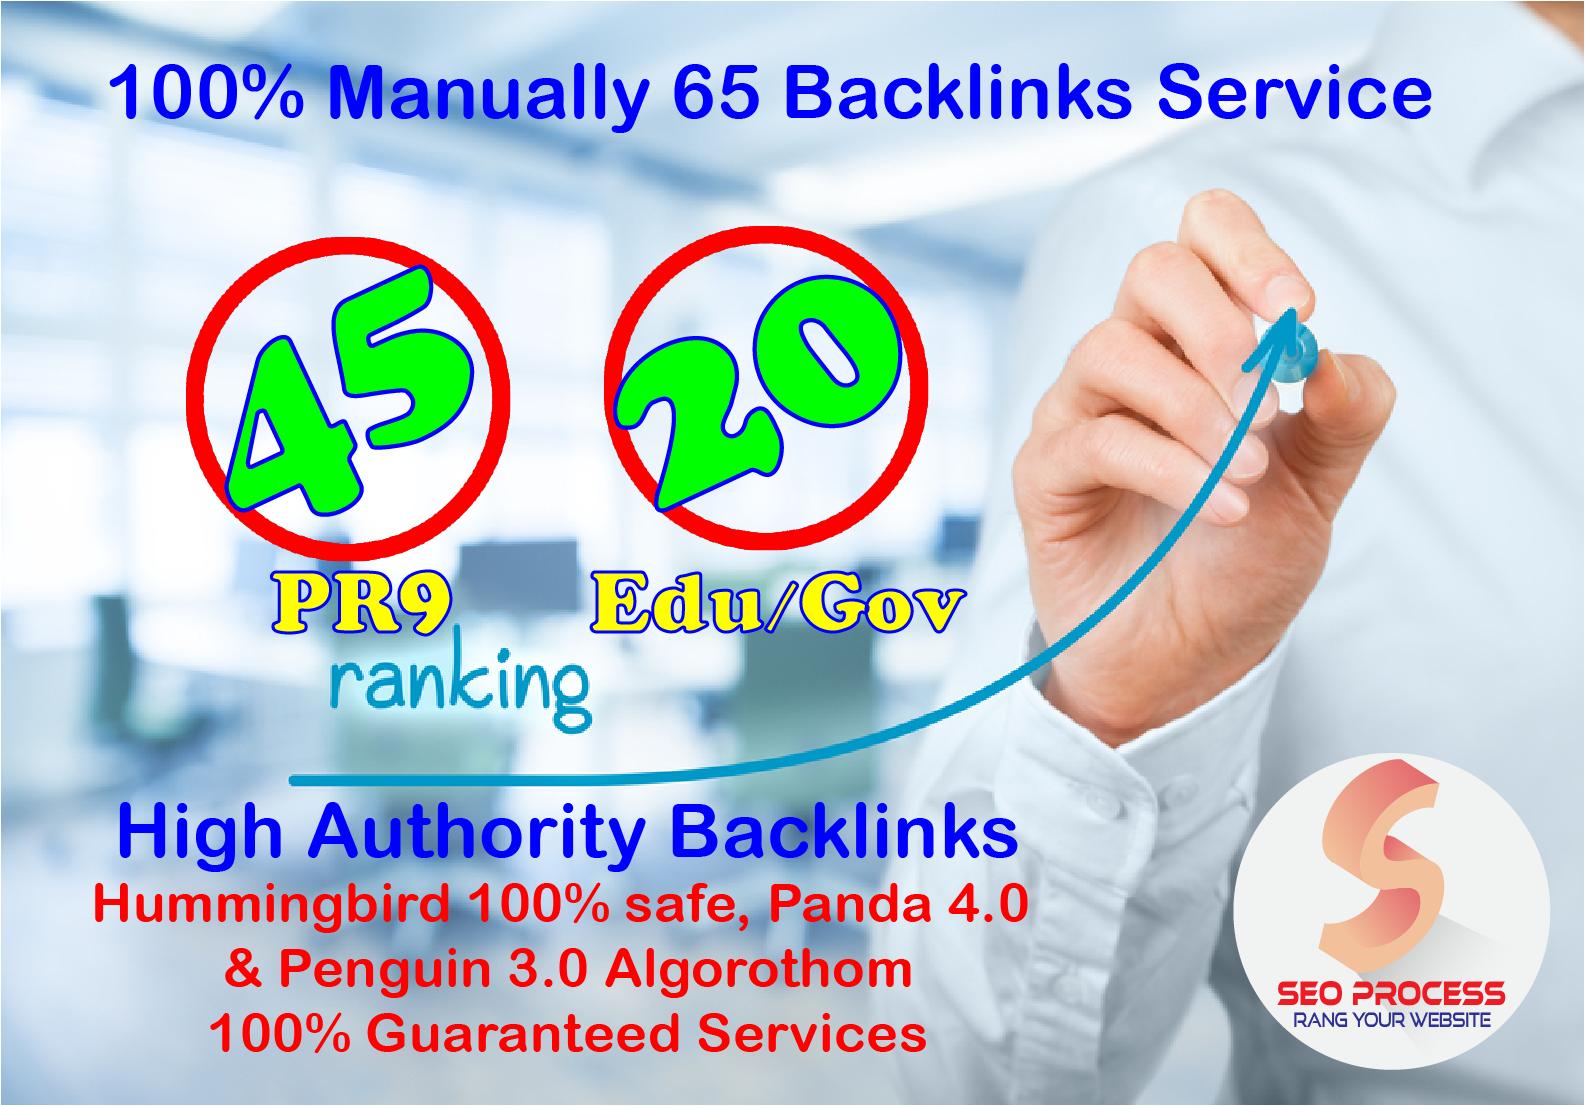 45 Pr9 Dofollow + 20 Edu - Gov High SEO Authority Backlinks - Fire Your Google Ranking